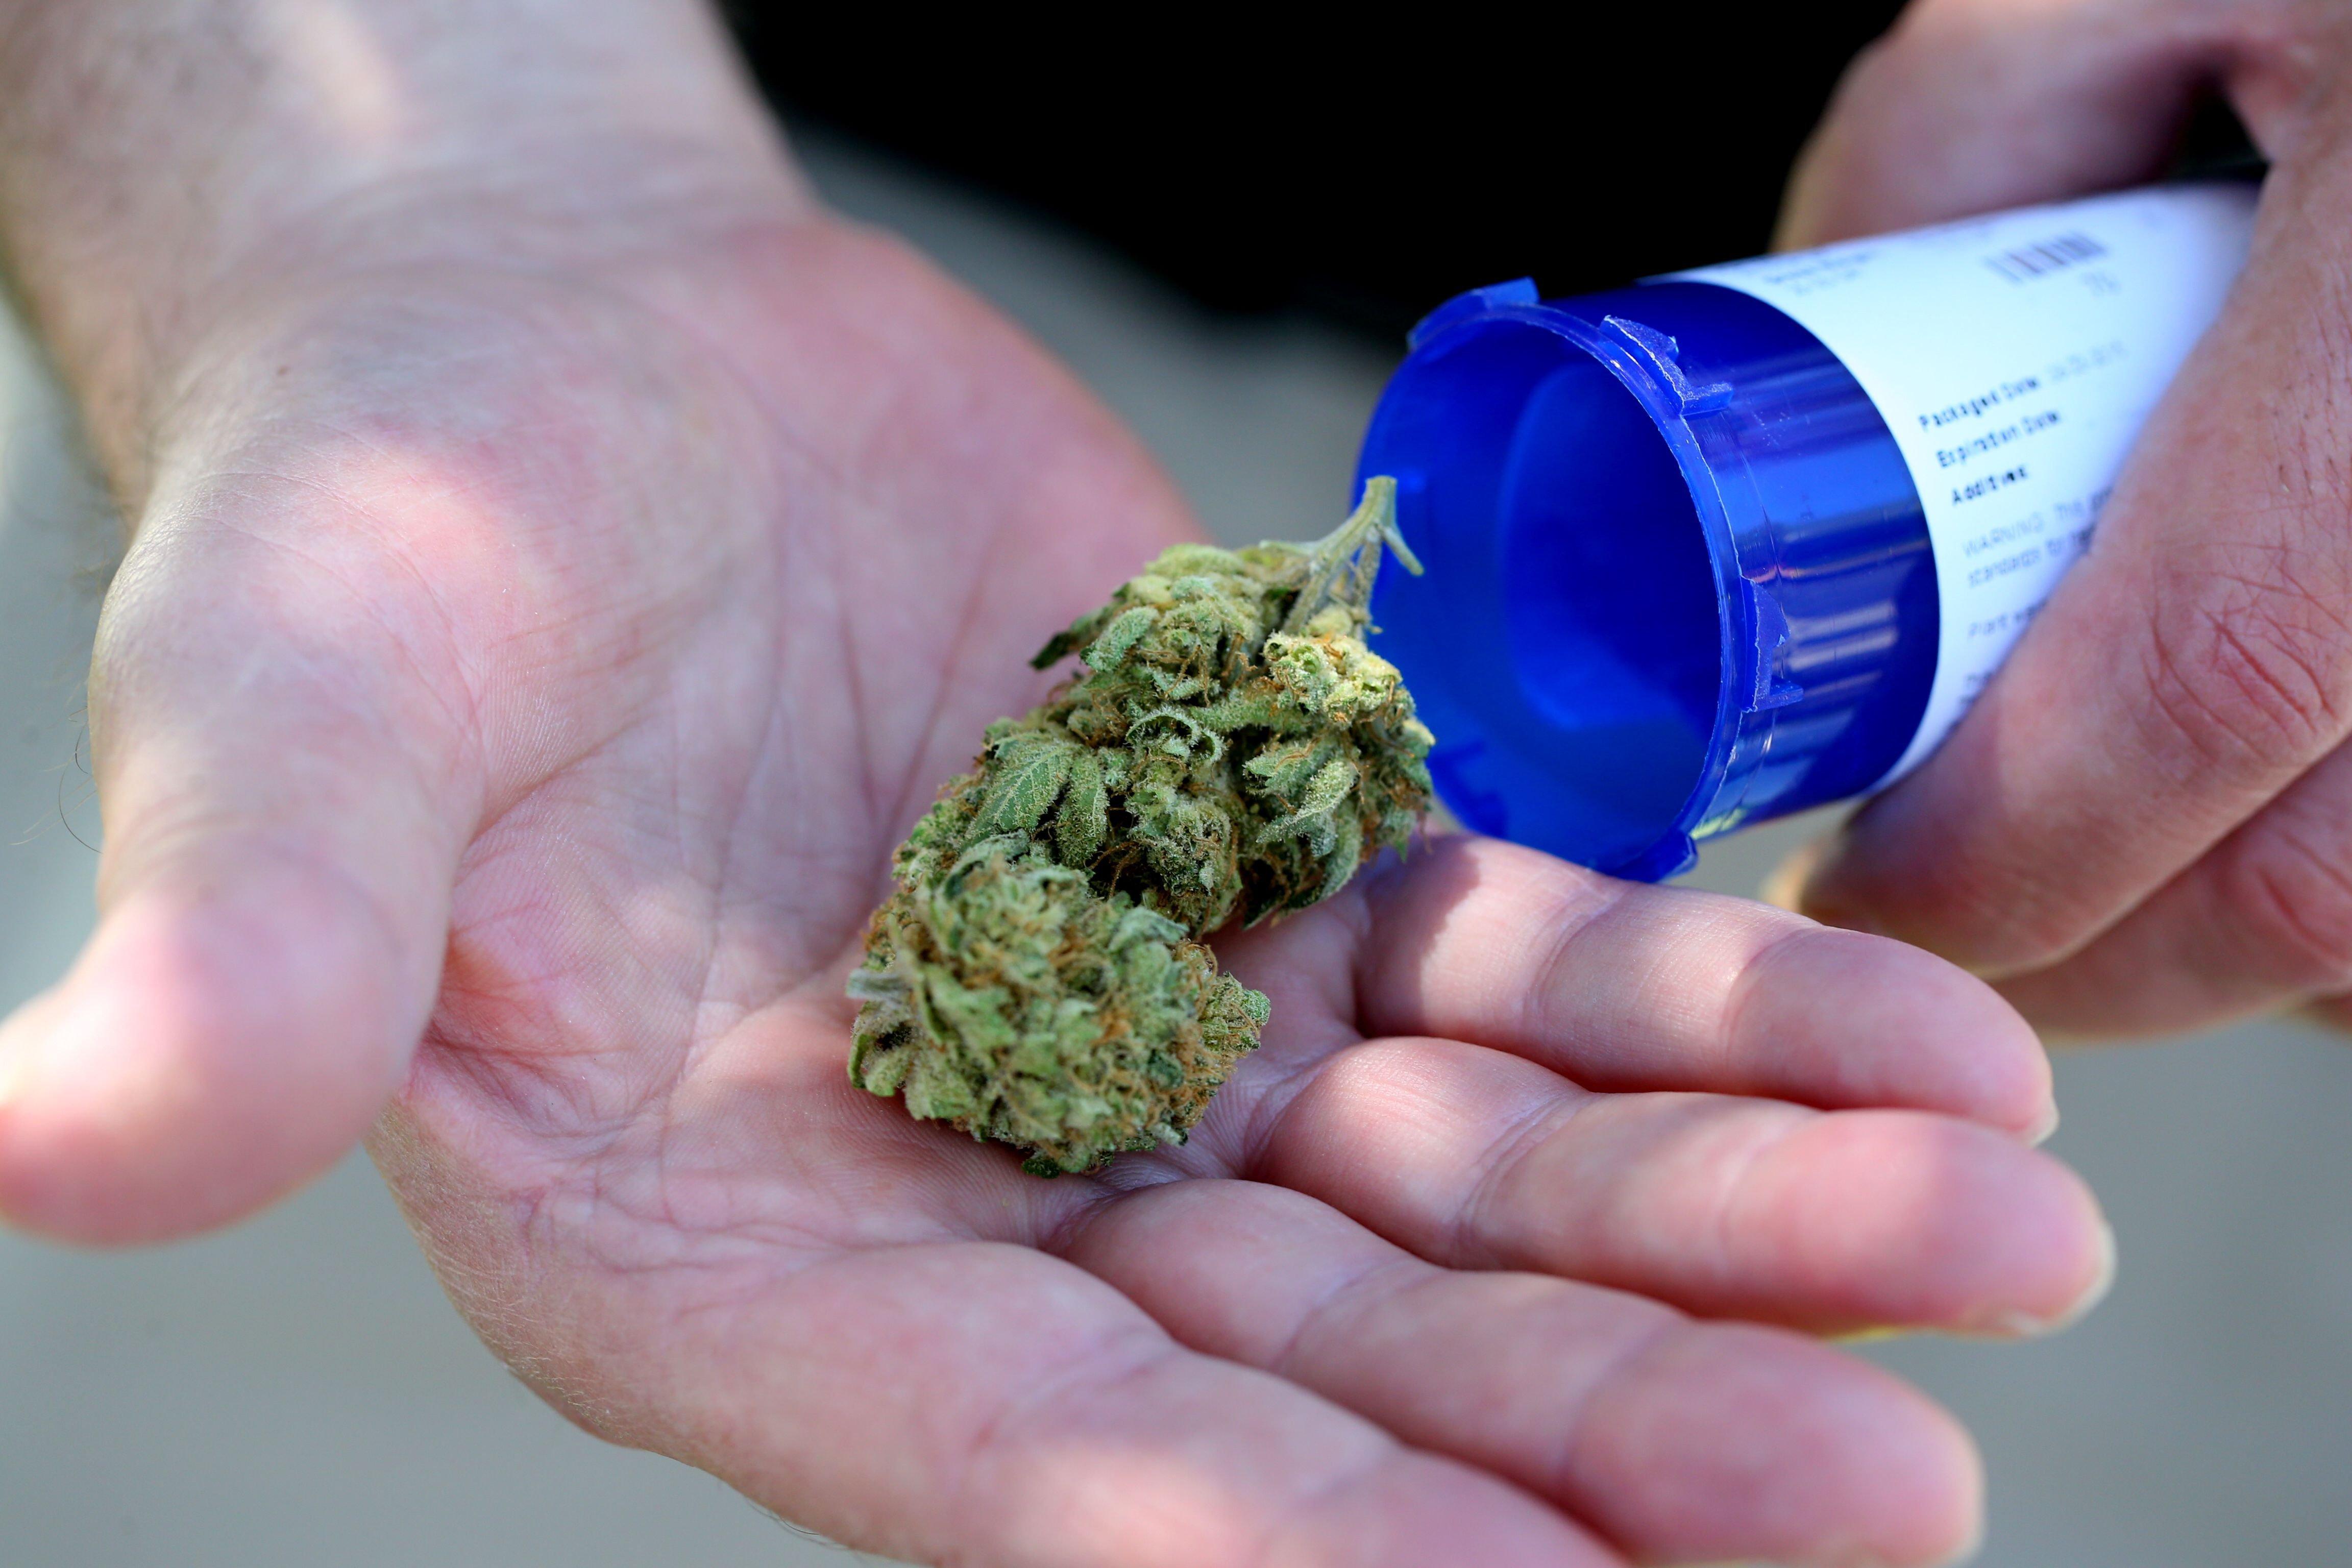 US lawmakers look to legalize pot in 'historic' marijuana reform hearing